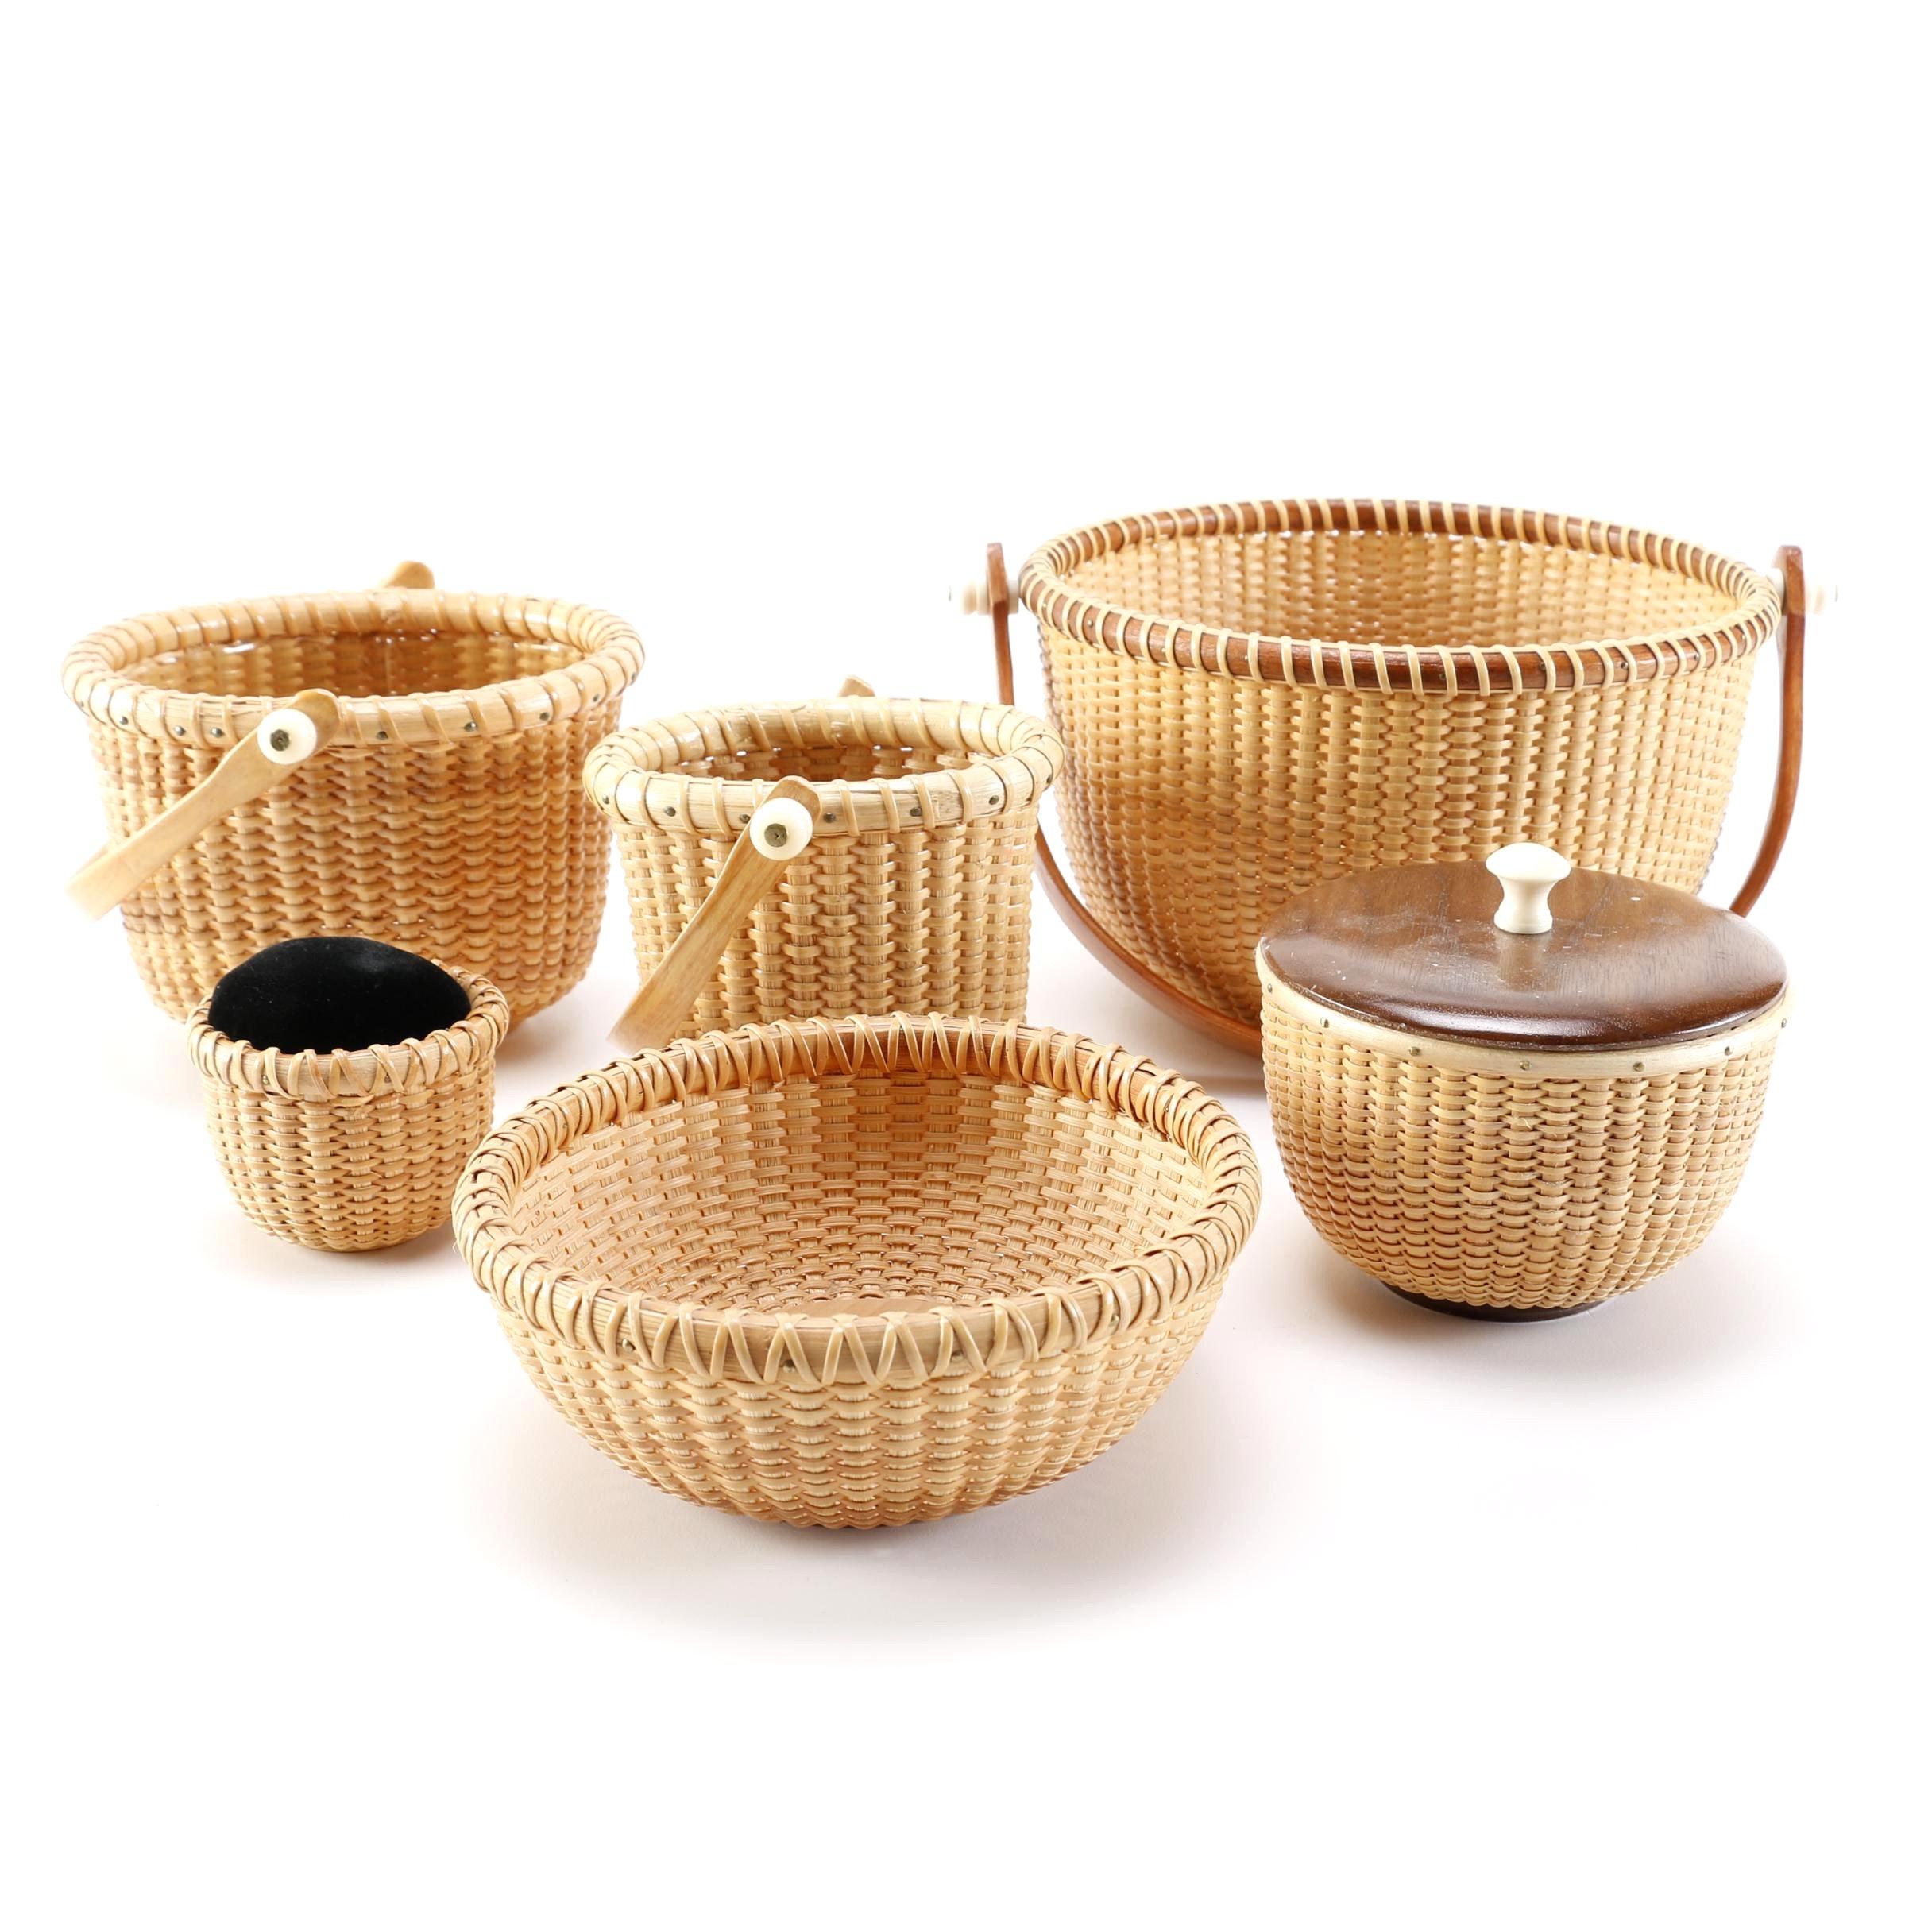 Nantucket Baskets